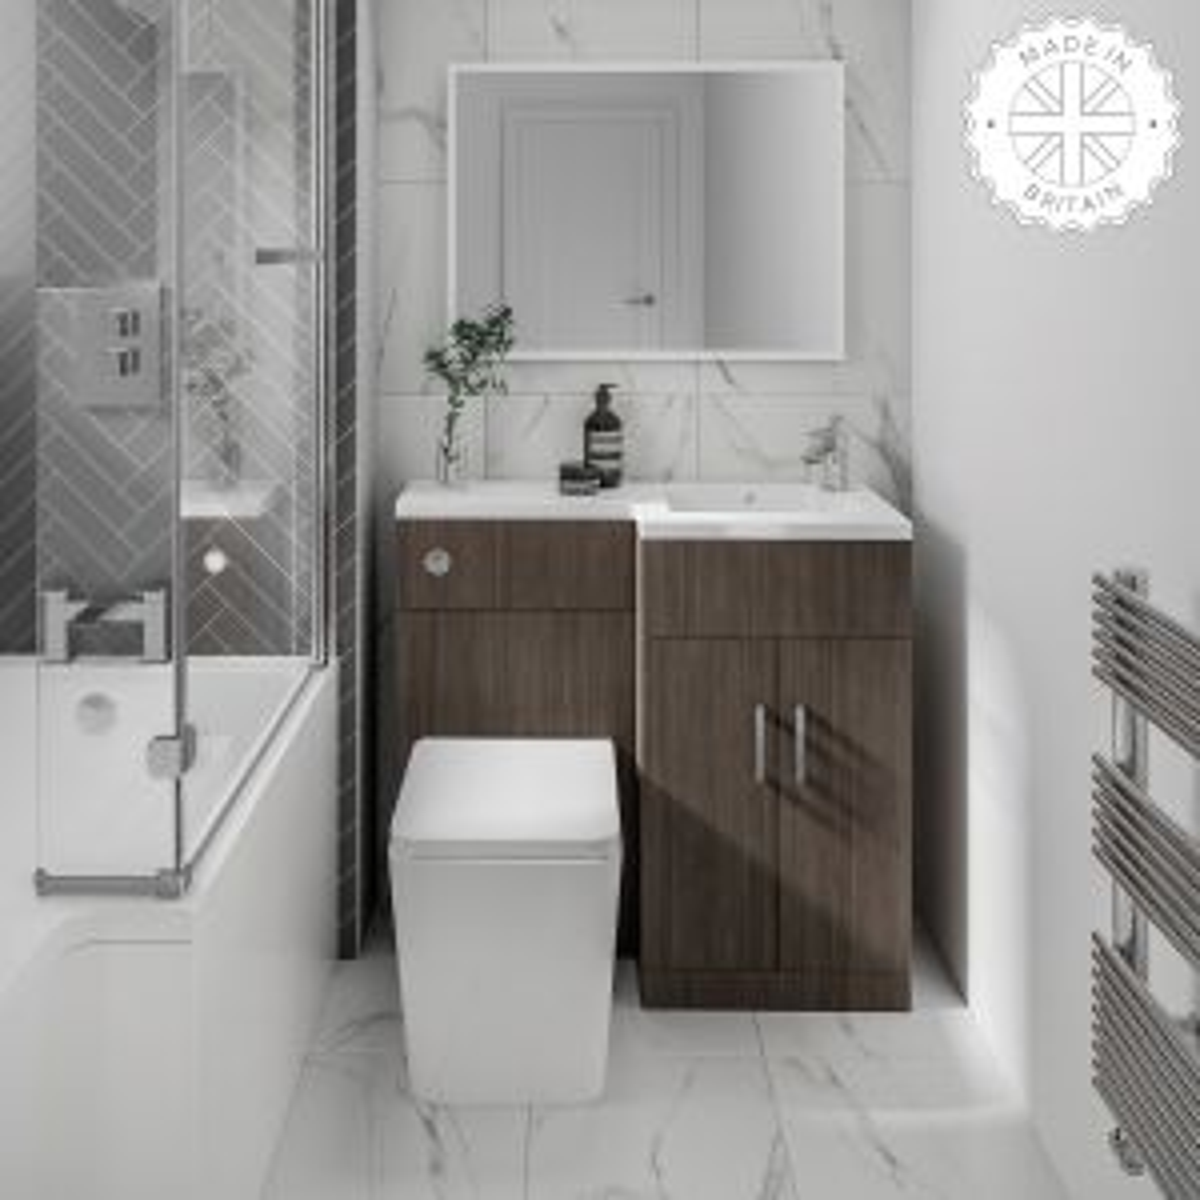 Elation Compact Combination L Shape Bodega Grey Furniture Pack 920mm